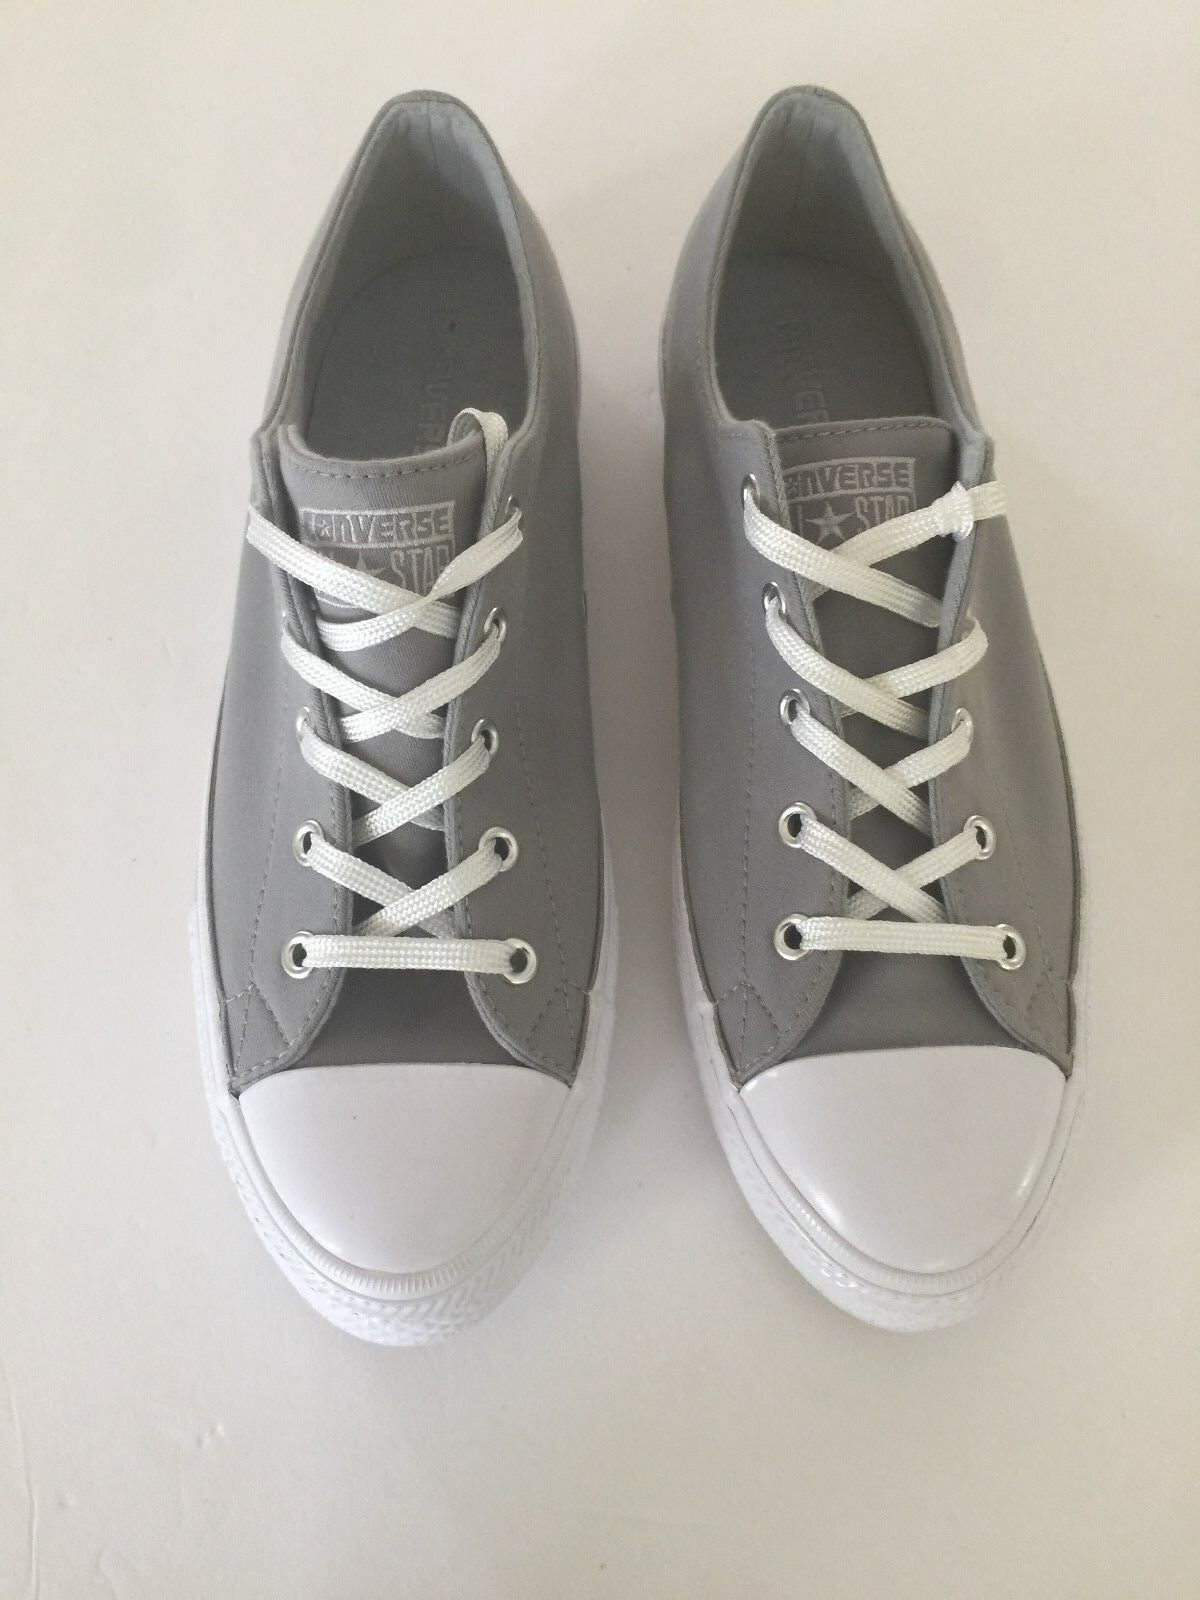 Converse 554426C CTAS WHITE GEMMA OX DOLPHIN MOUSE WHITE CTAS Size 10 Free shipping ba9a92